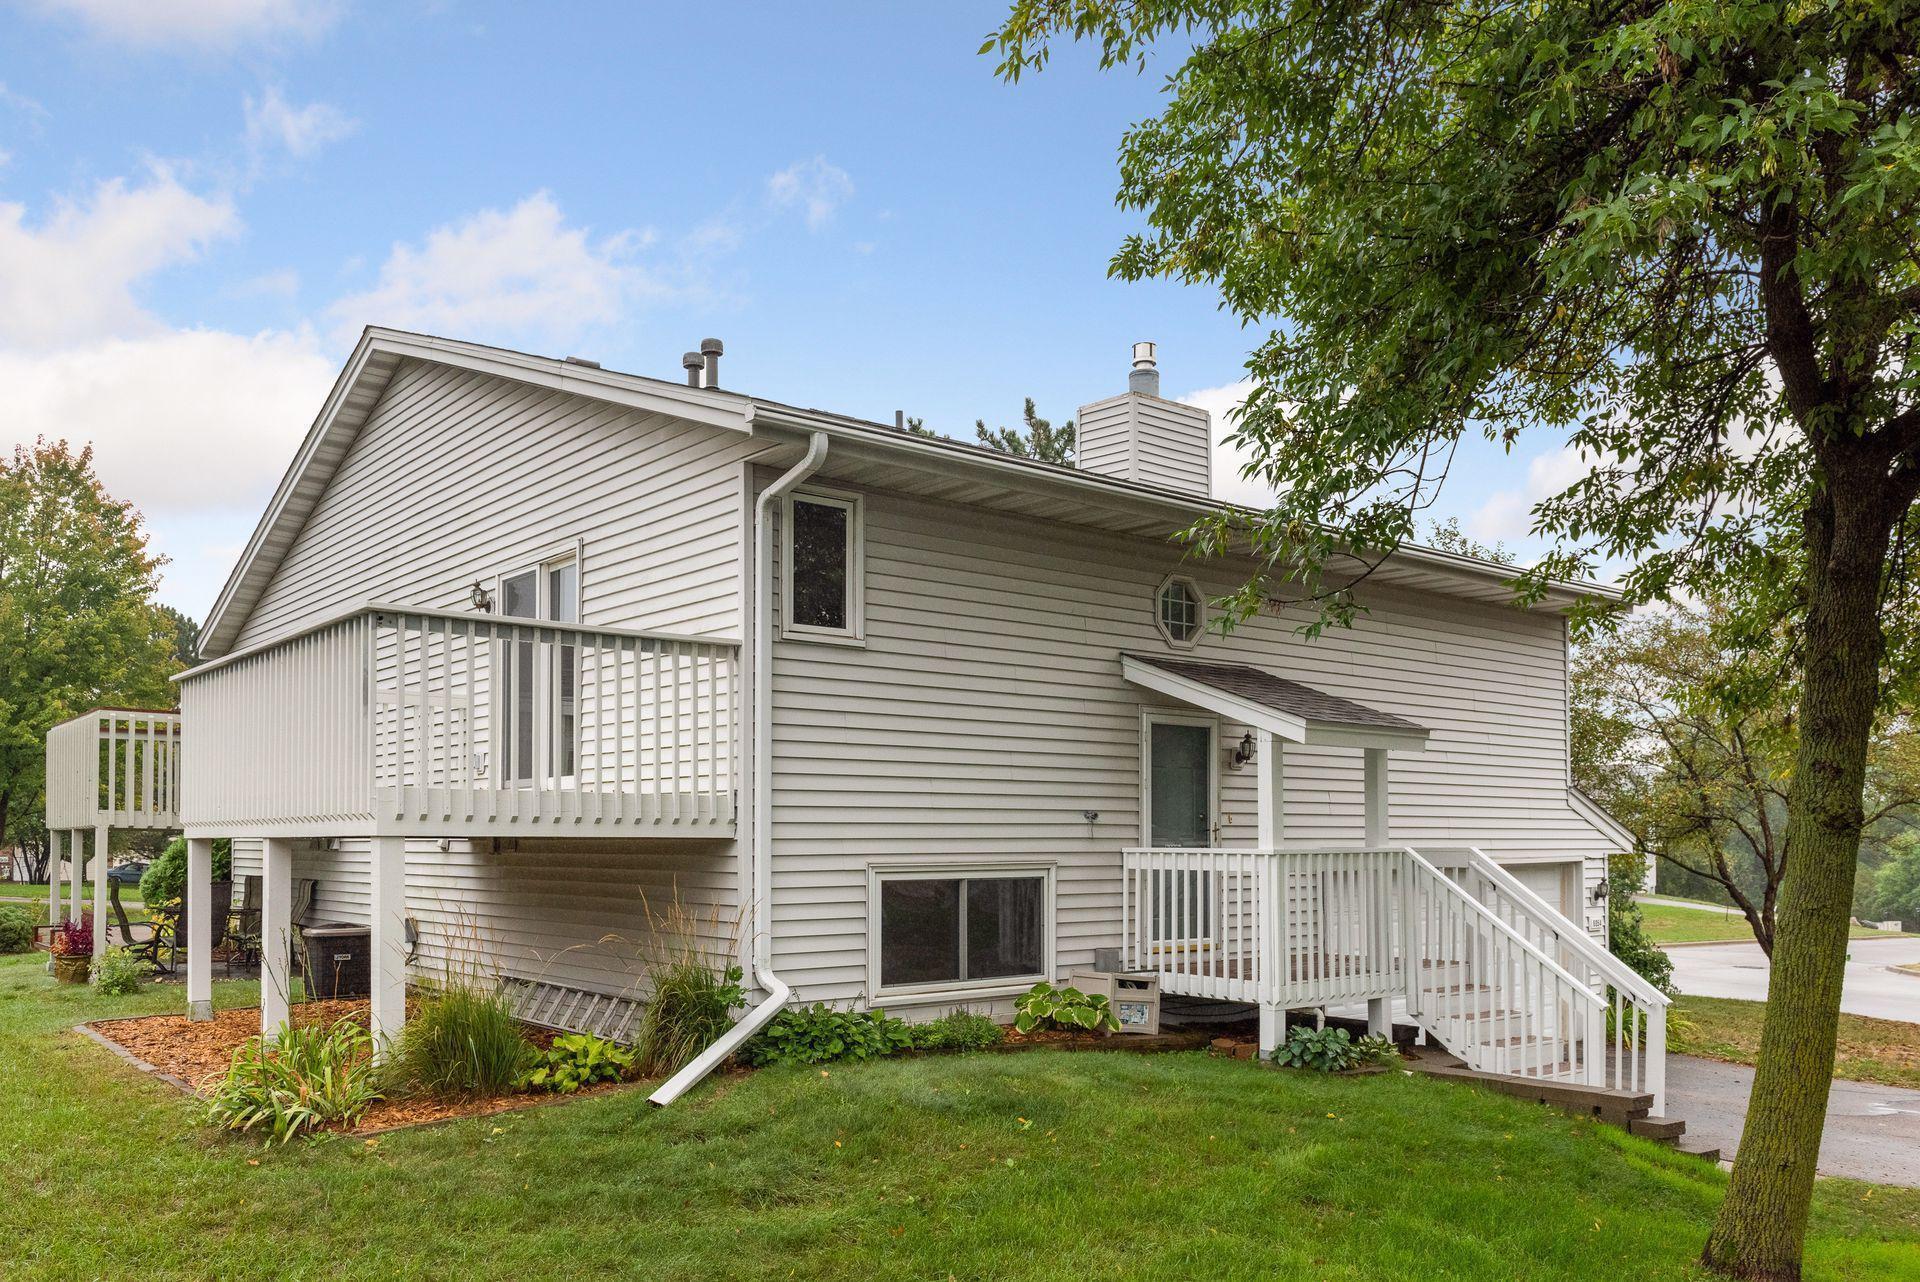 6054 Covington Terrace, Minnetonka, MN 55345